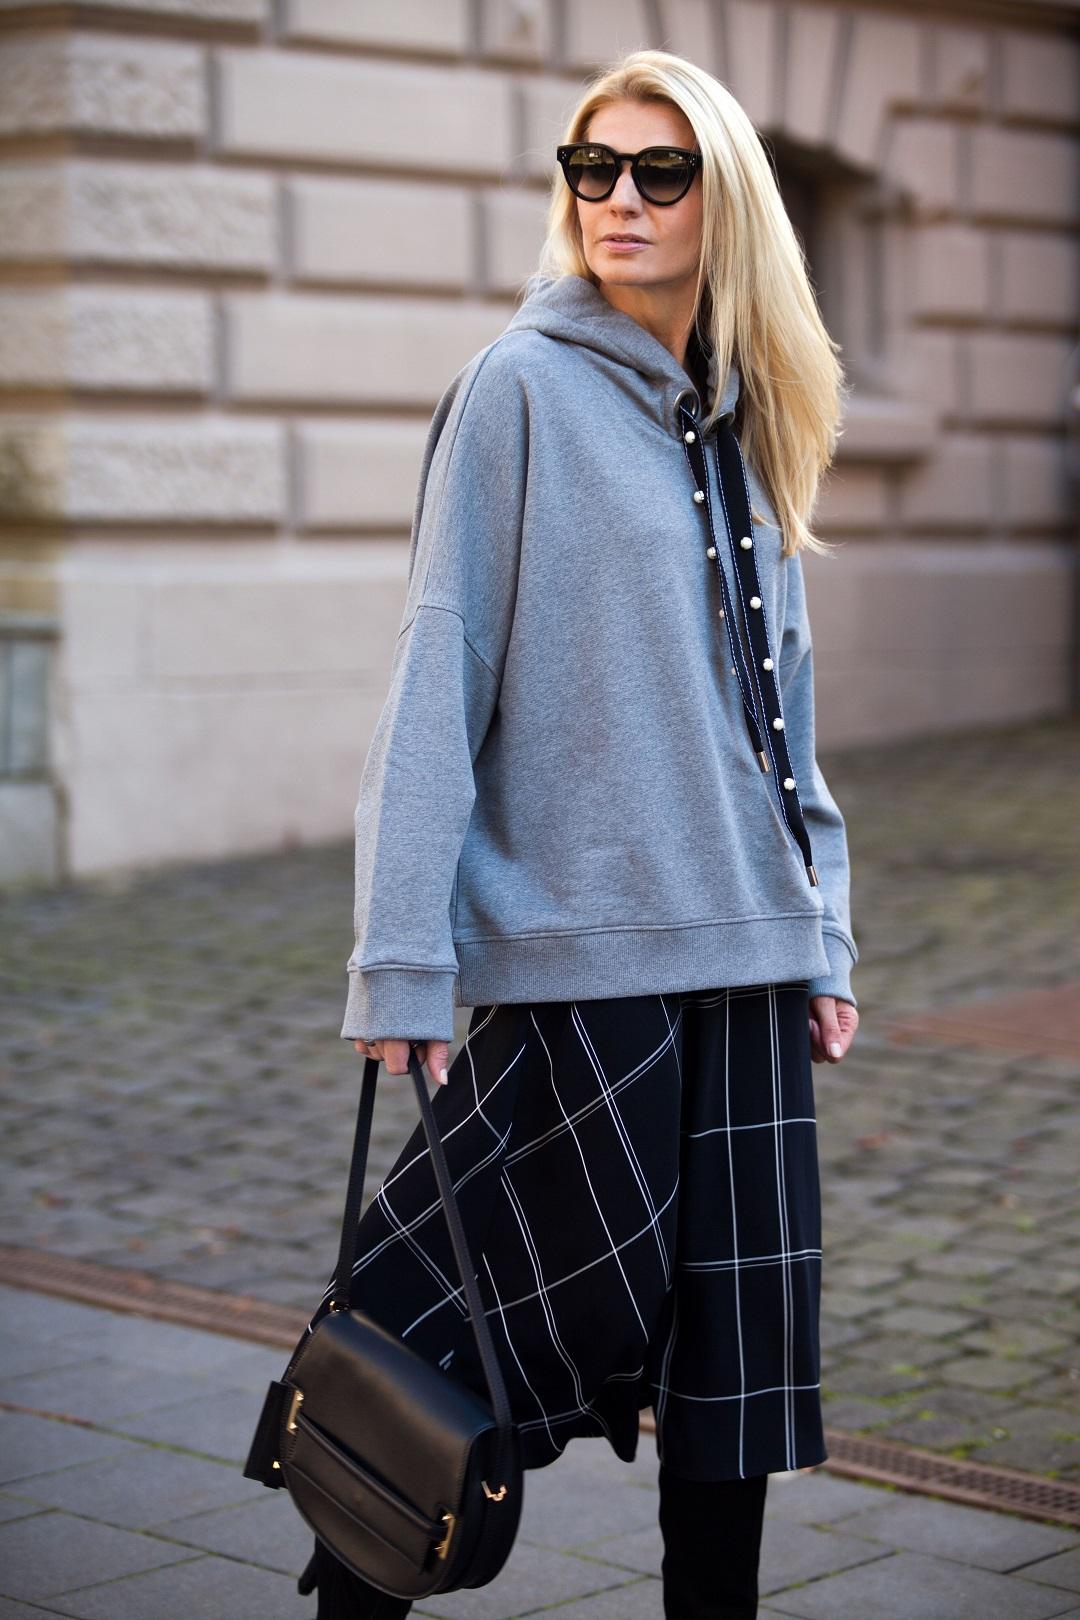 L.K. Bennett London skirt and Dorothee Schumacher Hoodie